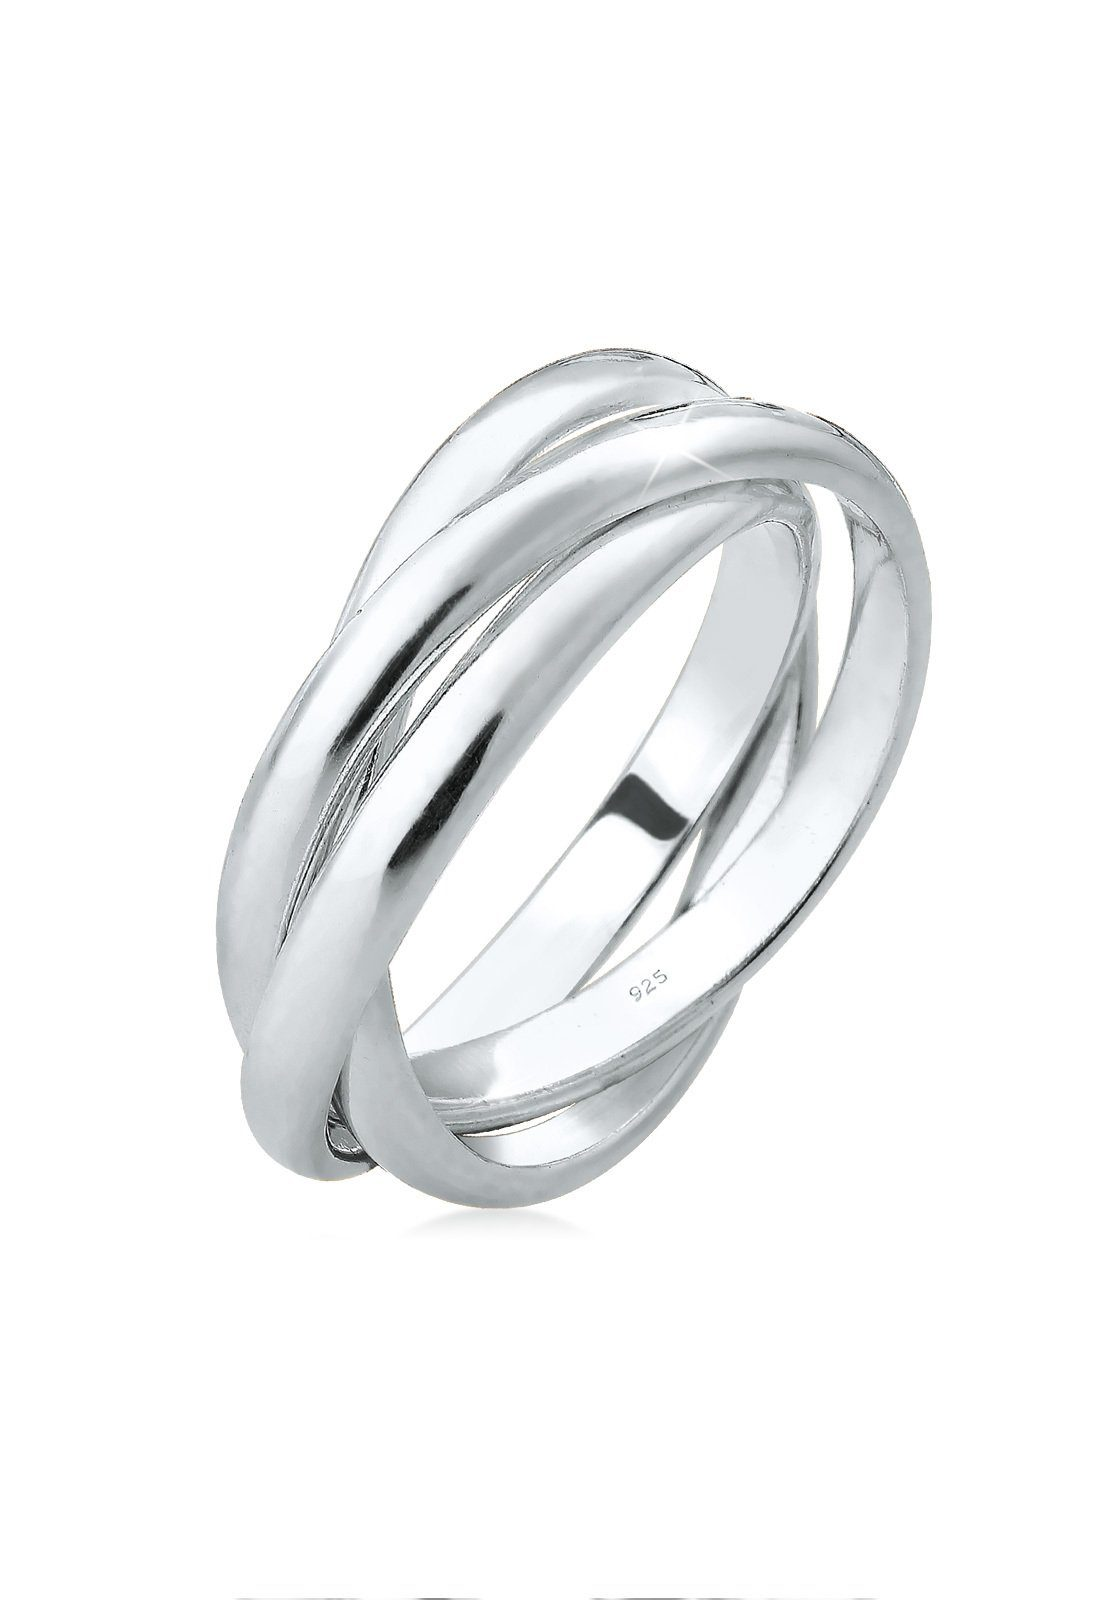 Elli Fingerring »Wickelring Trio Trini Basic 925 Silber«, Wickelring online kaufen | OTTO